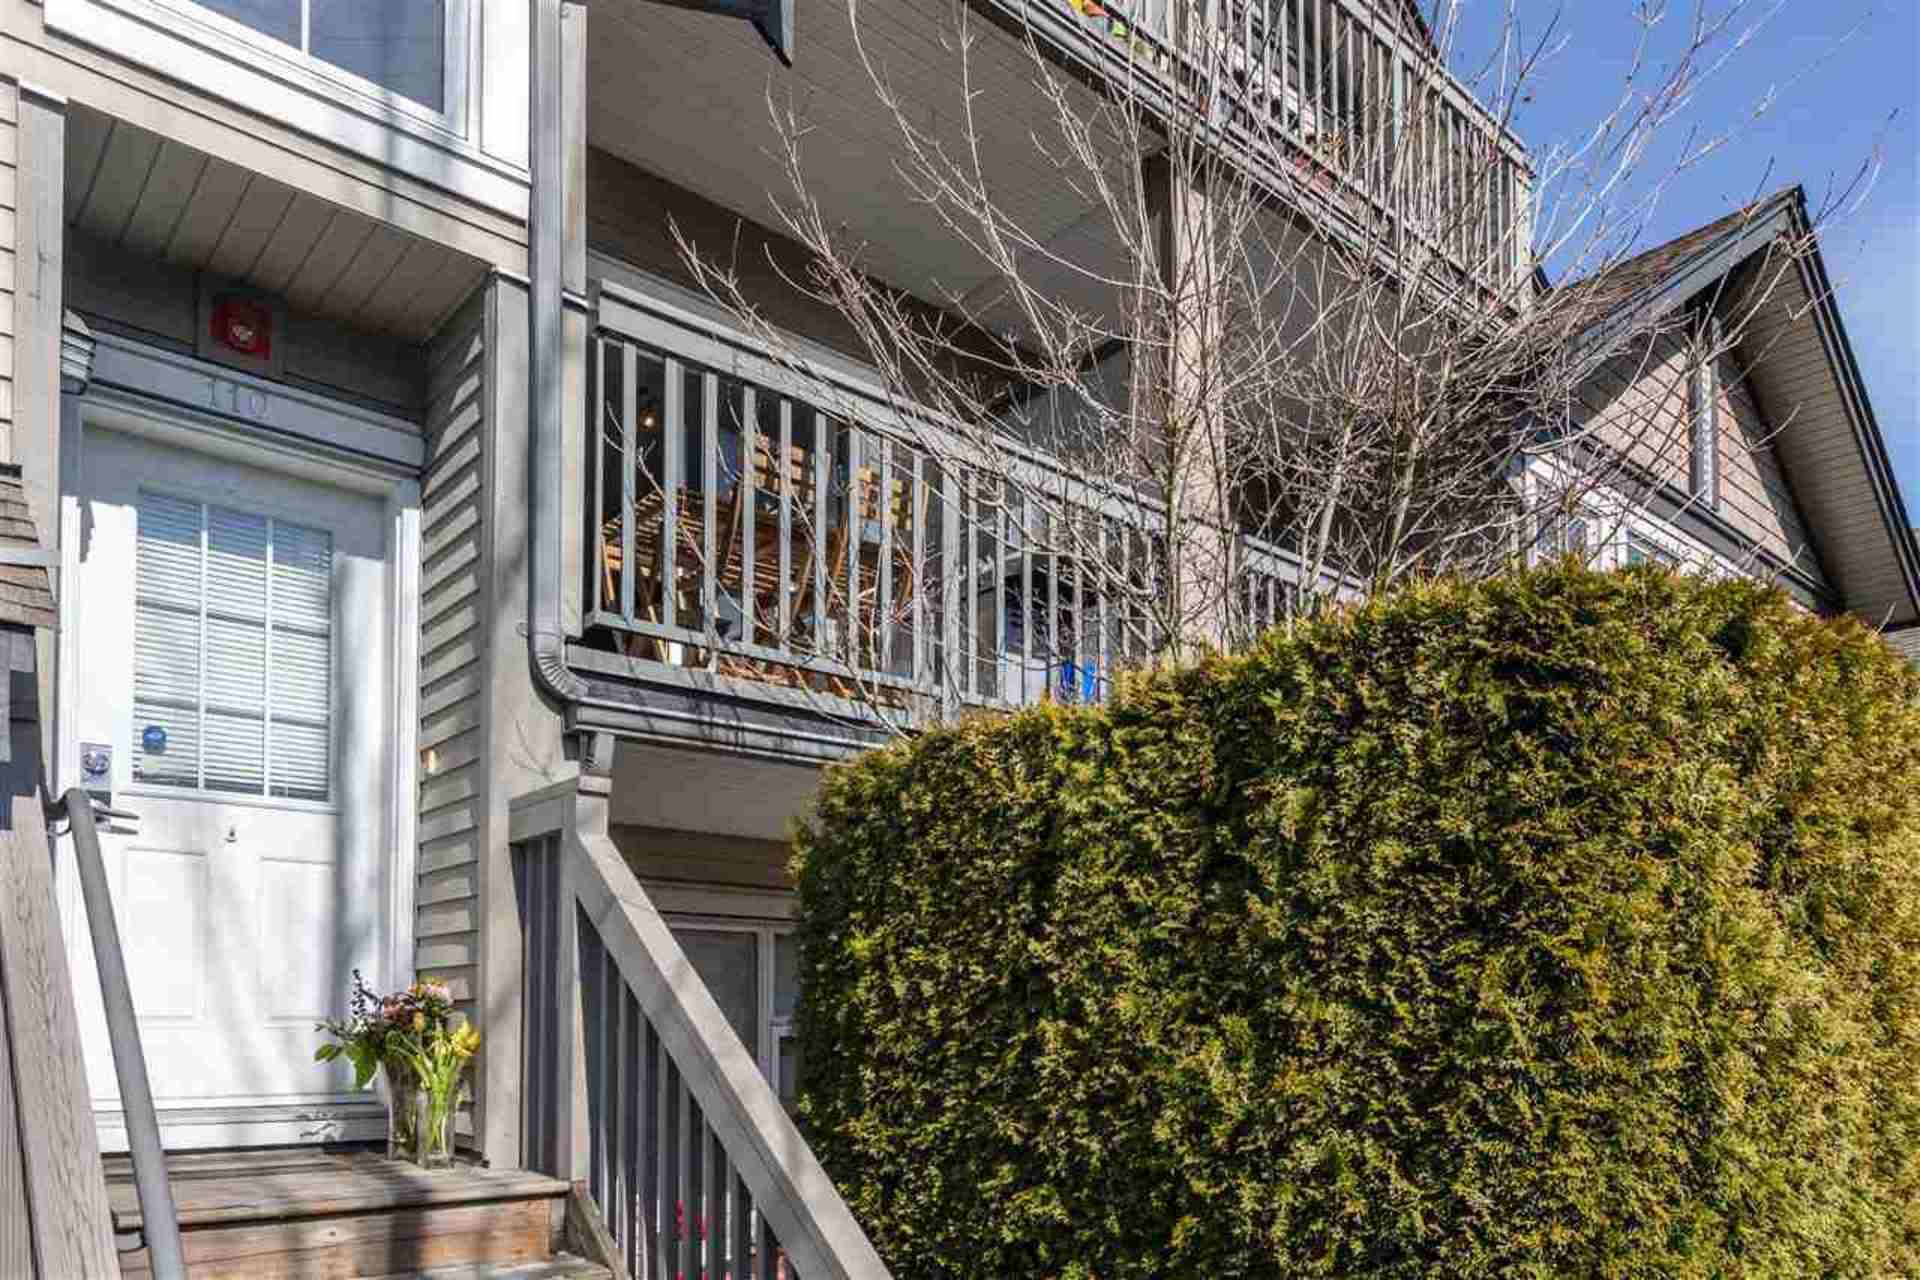 4438-albert-street-vancouver-heights-burnaby-north-15 at 110 - 4438 Albert Street, Vancouver Heights, Burnaby North